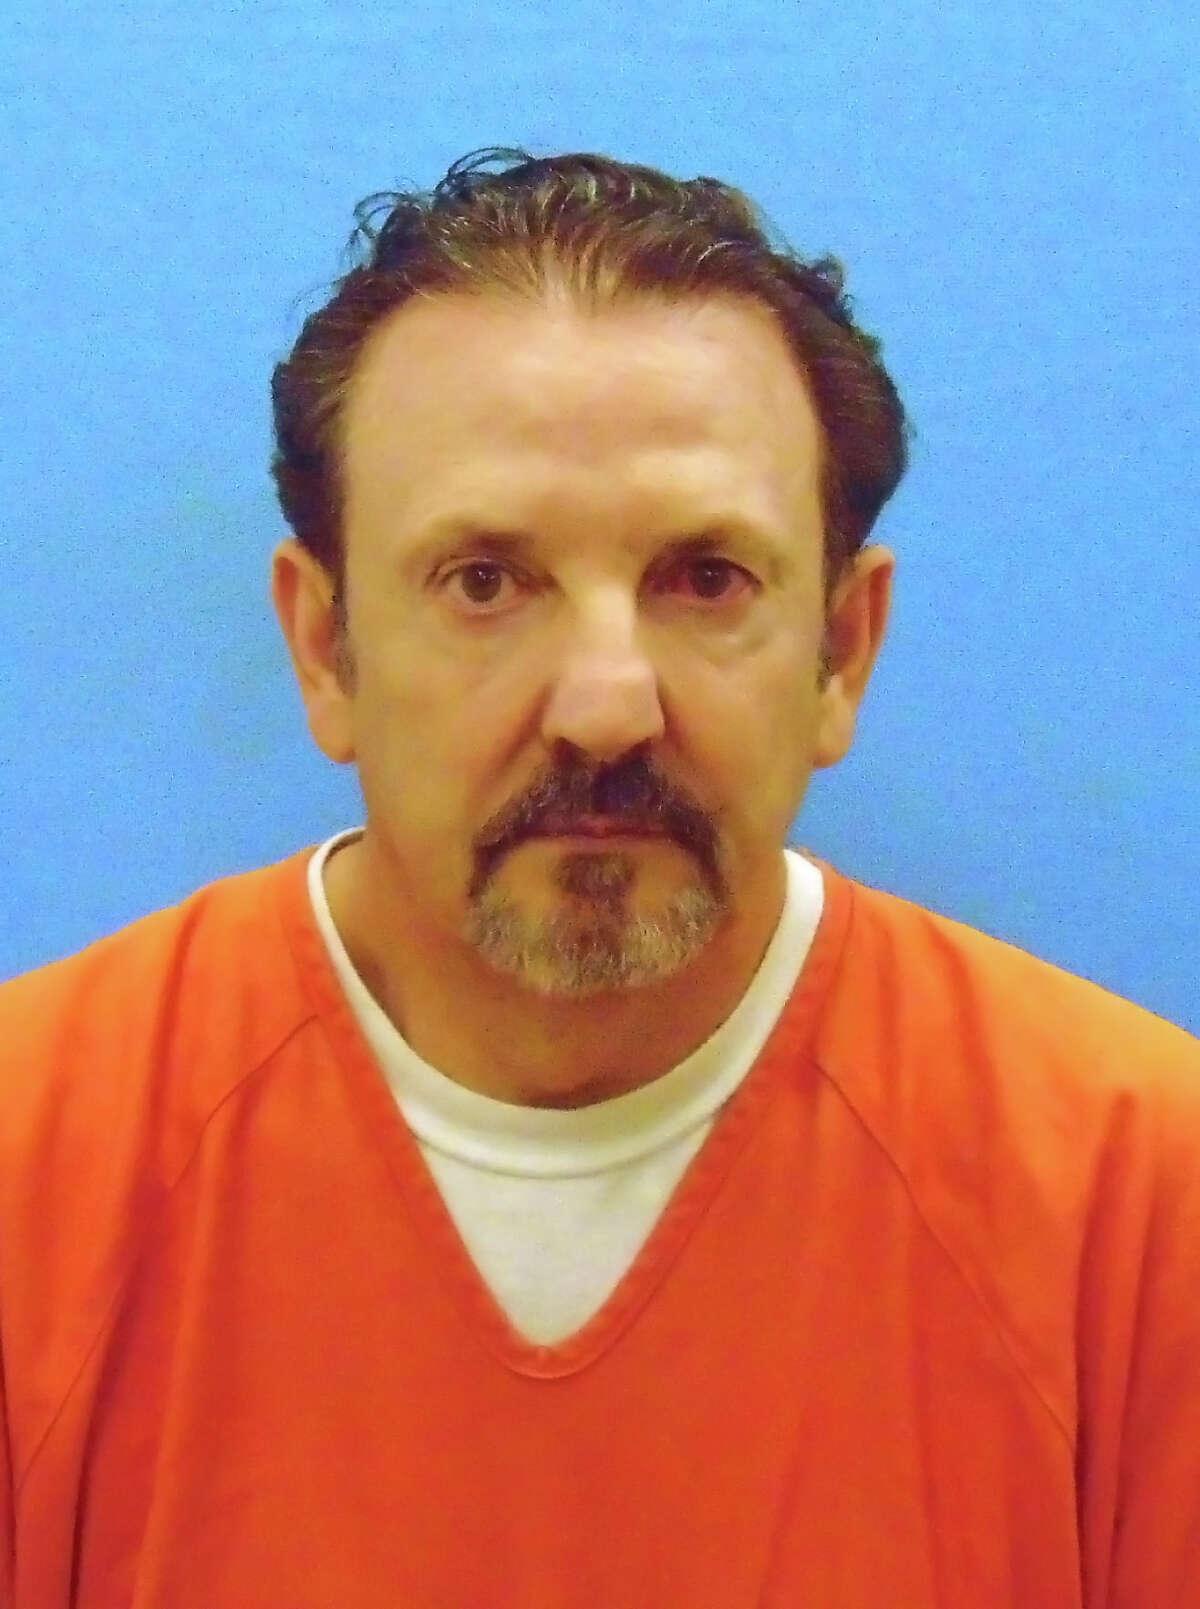 Rolando González Treviño was released from jail Thursday.